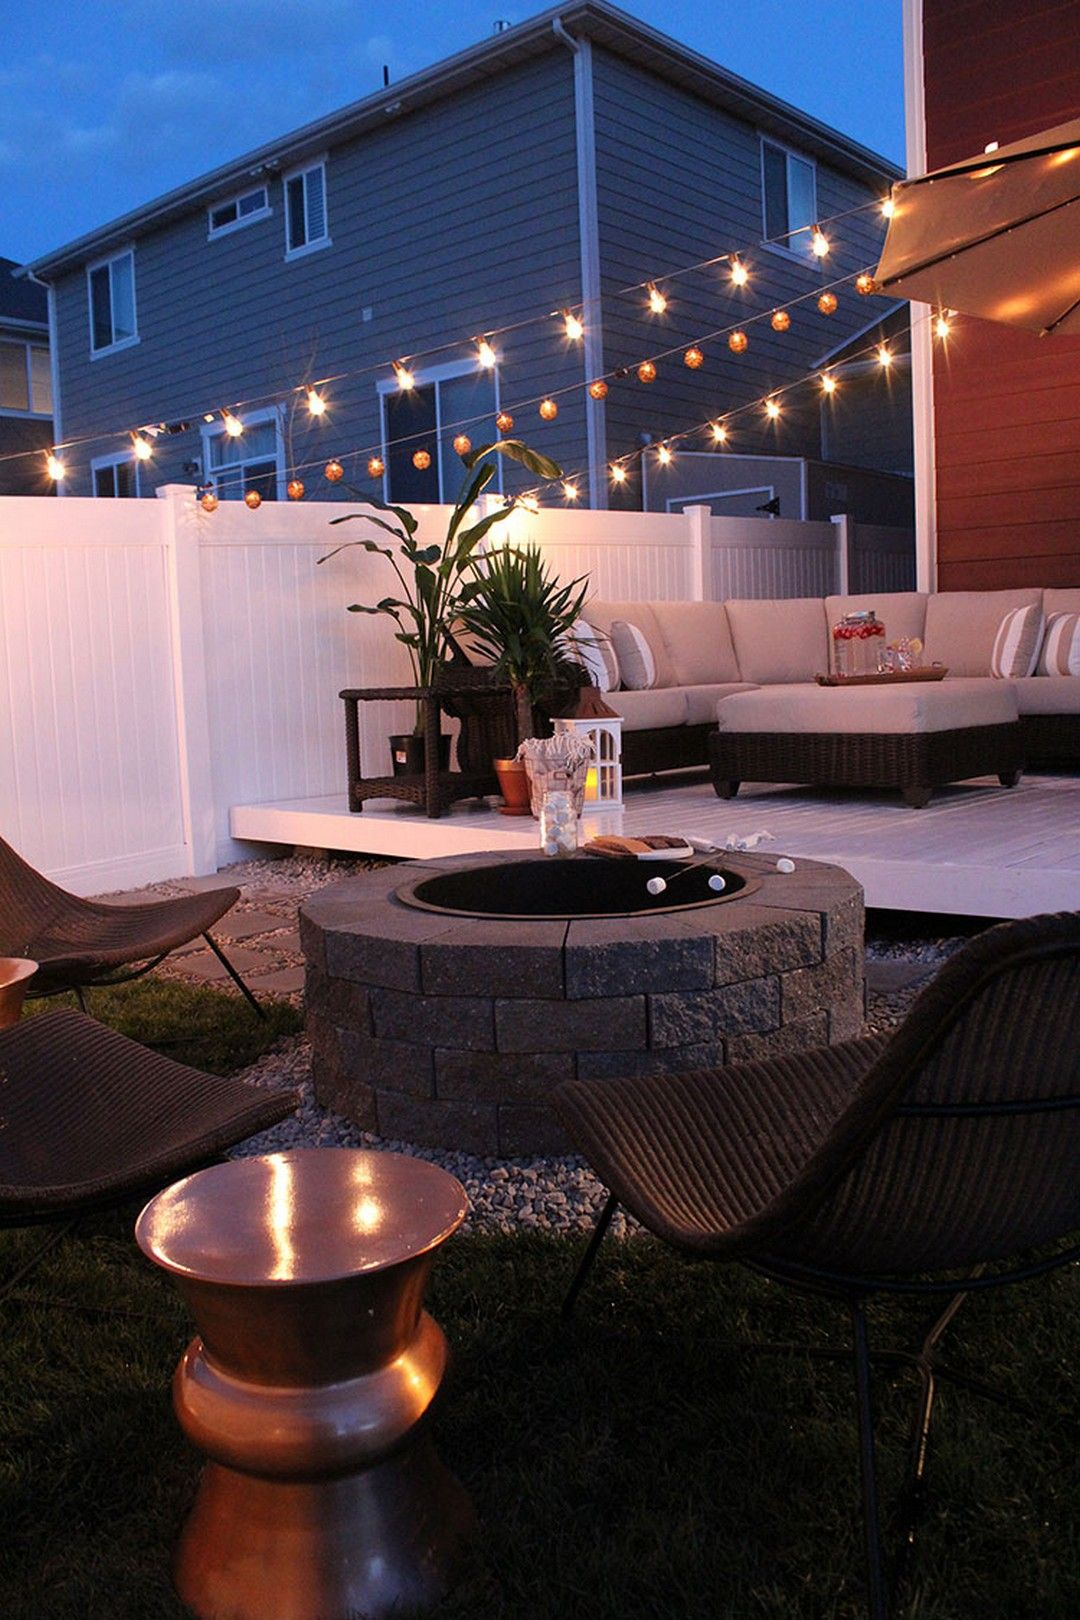 102 DIY Simple Small Backyard on a Budget Makeovers Ideas ... on Simple Patio Ideas On A Budget id=17668